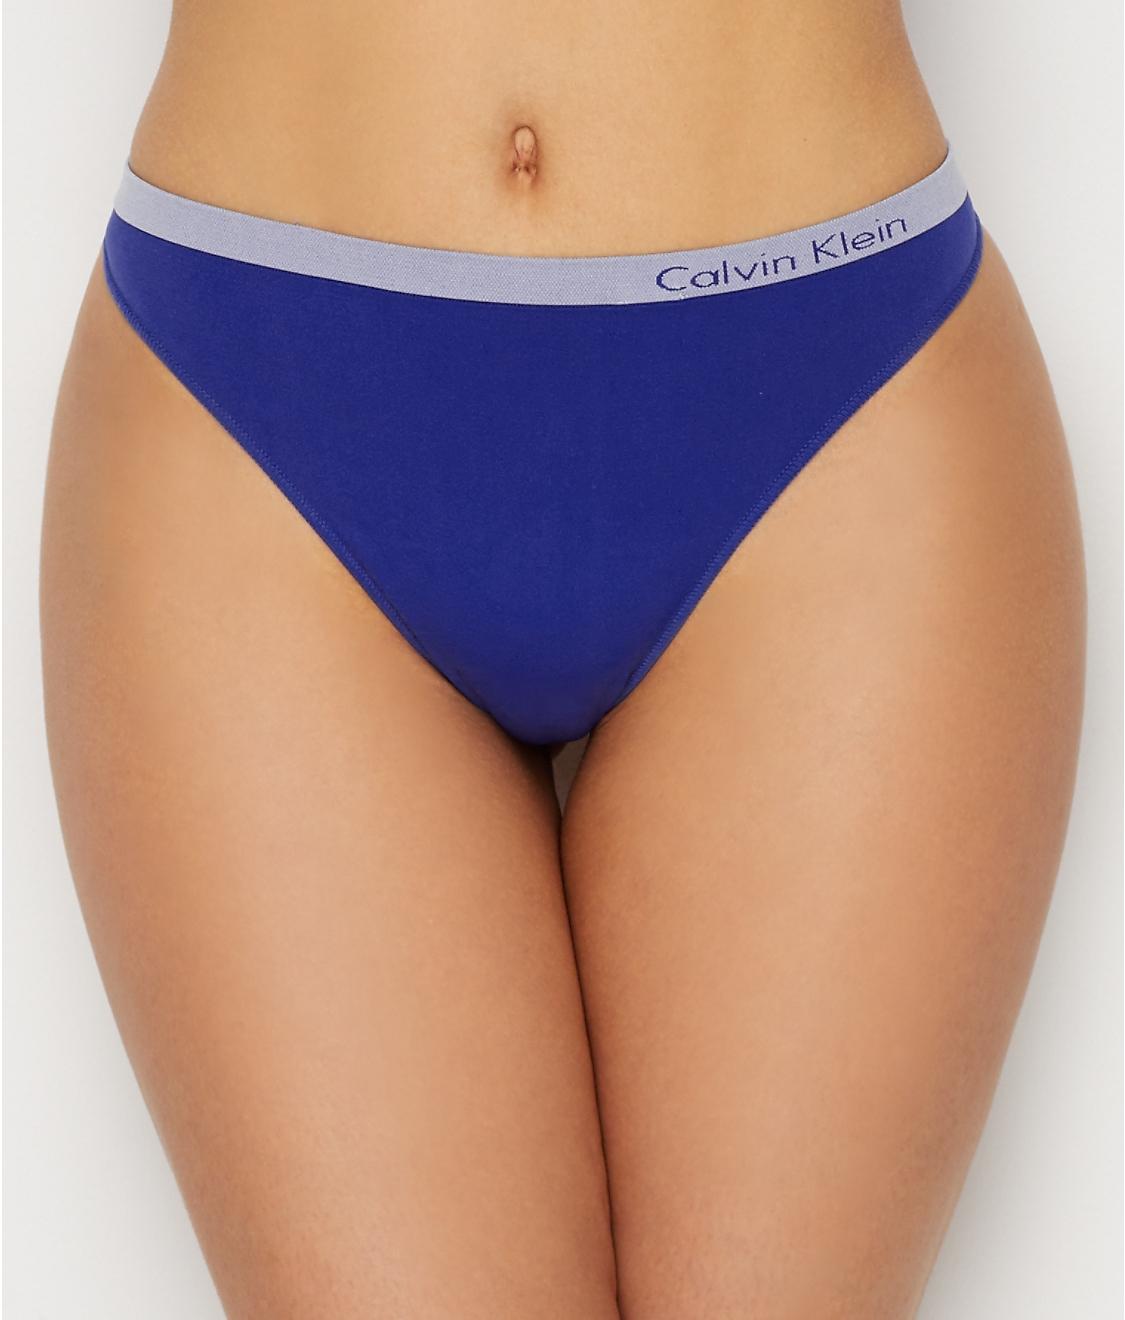 b59c905c401fa0 Calvin Klein Women's Pure Seamless Thong Panty Dark Midnight Size Large